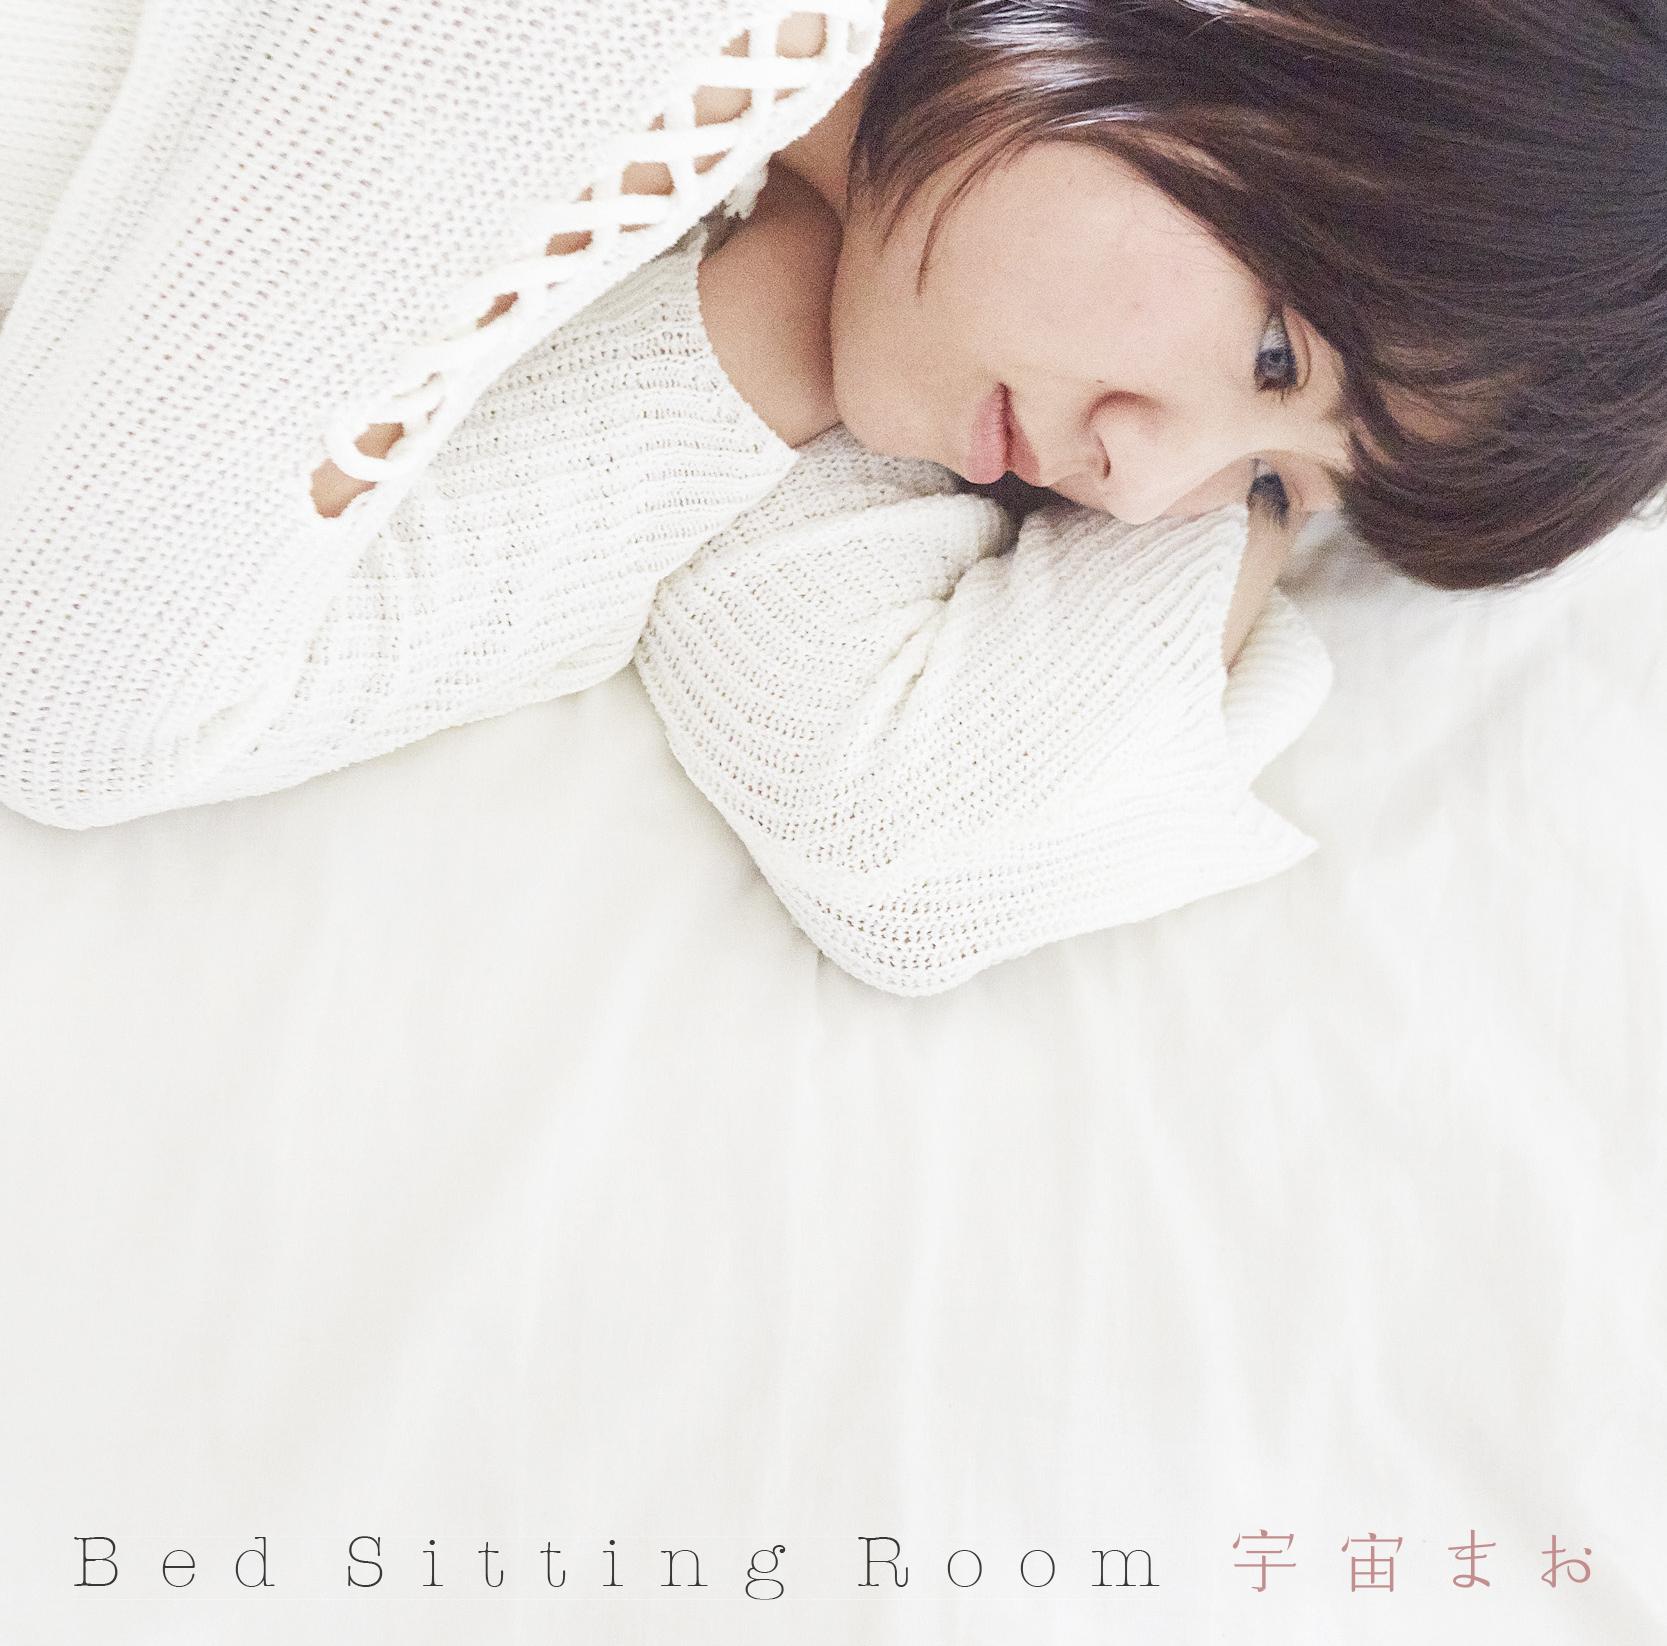 20181207.0159.4 Mao Uchu - Bed Sitting Room cover.jpg